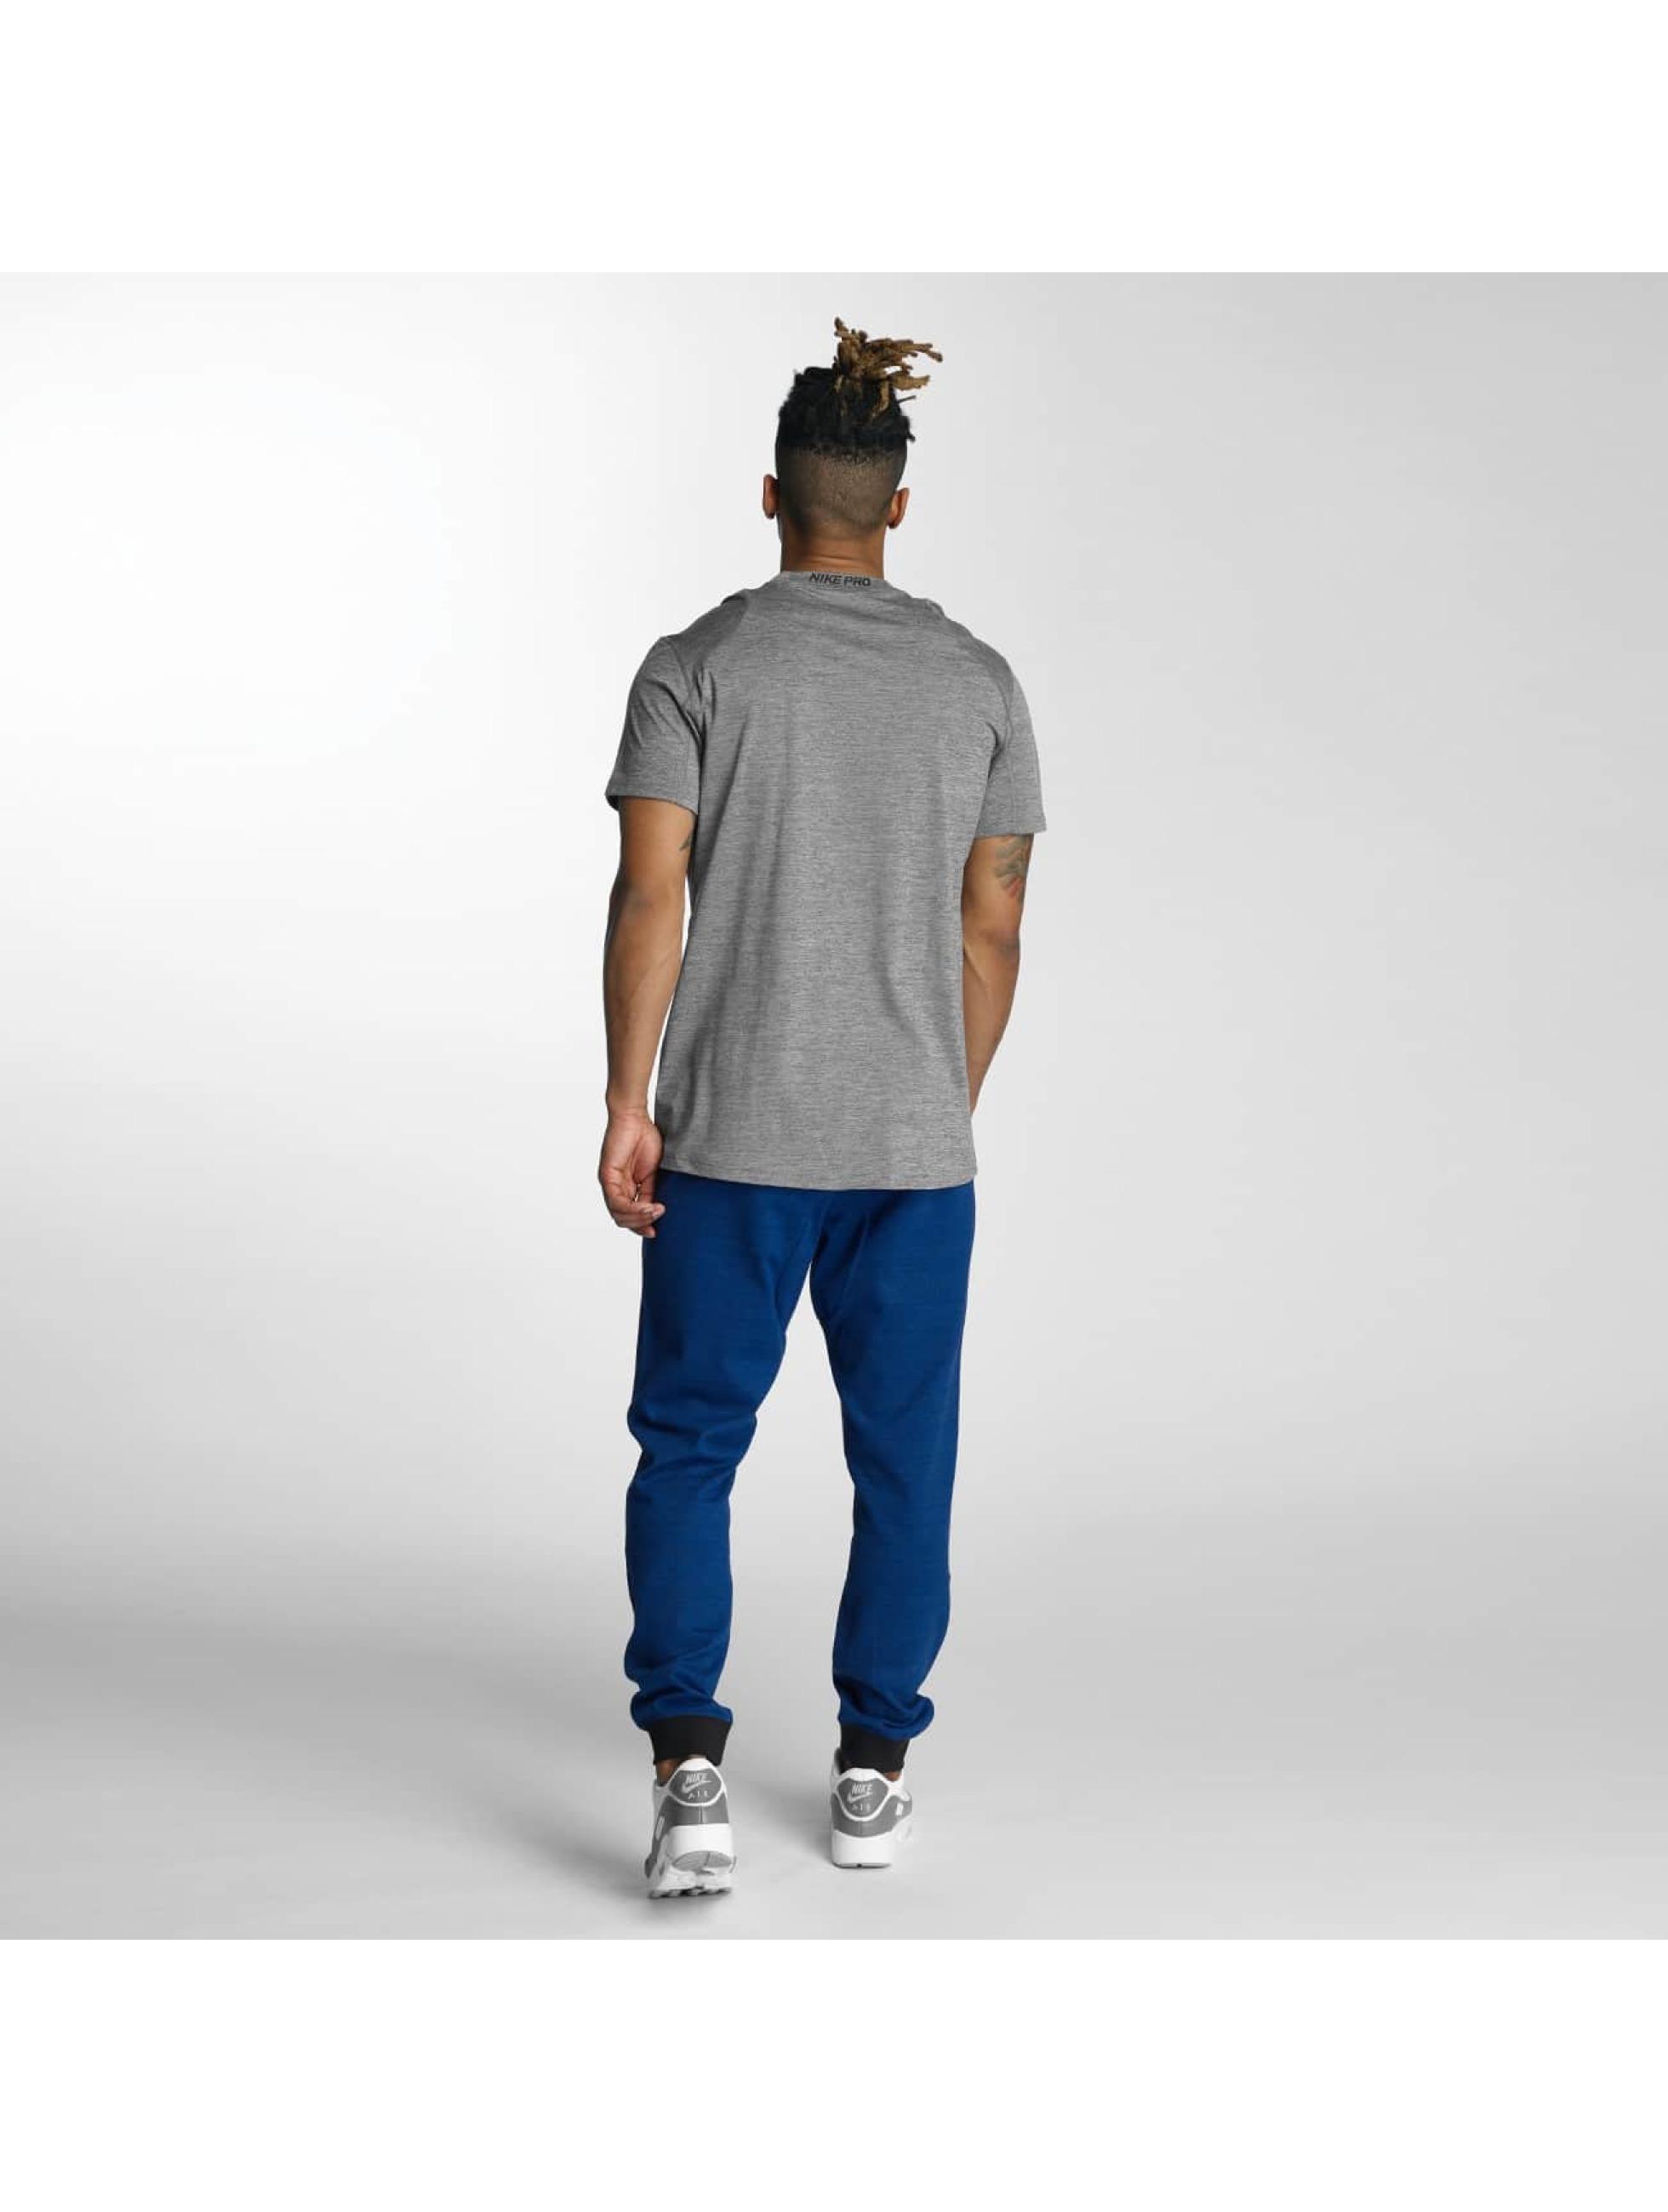 Nike Performance T-Shirt Top grey